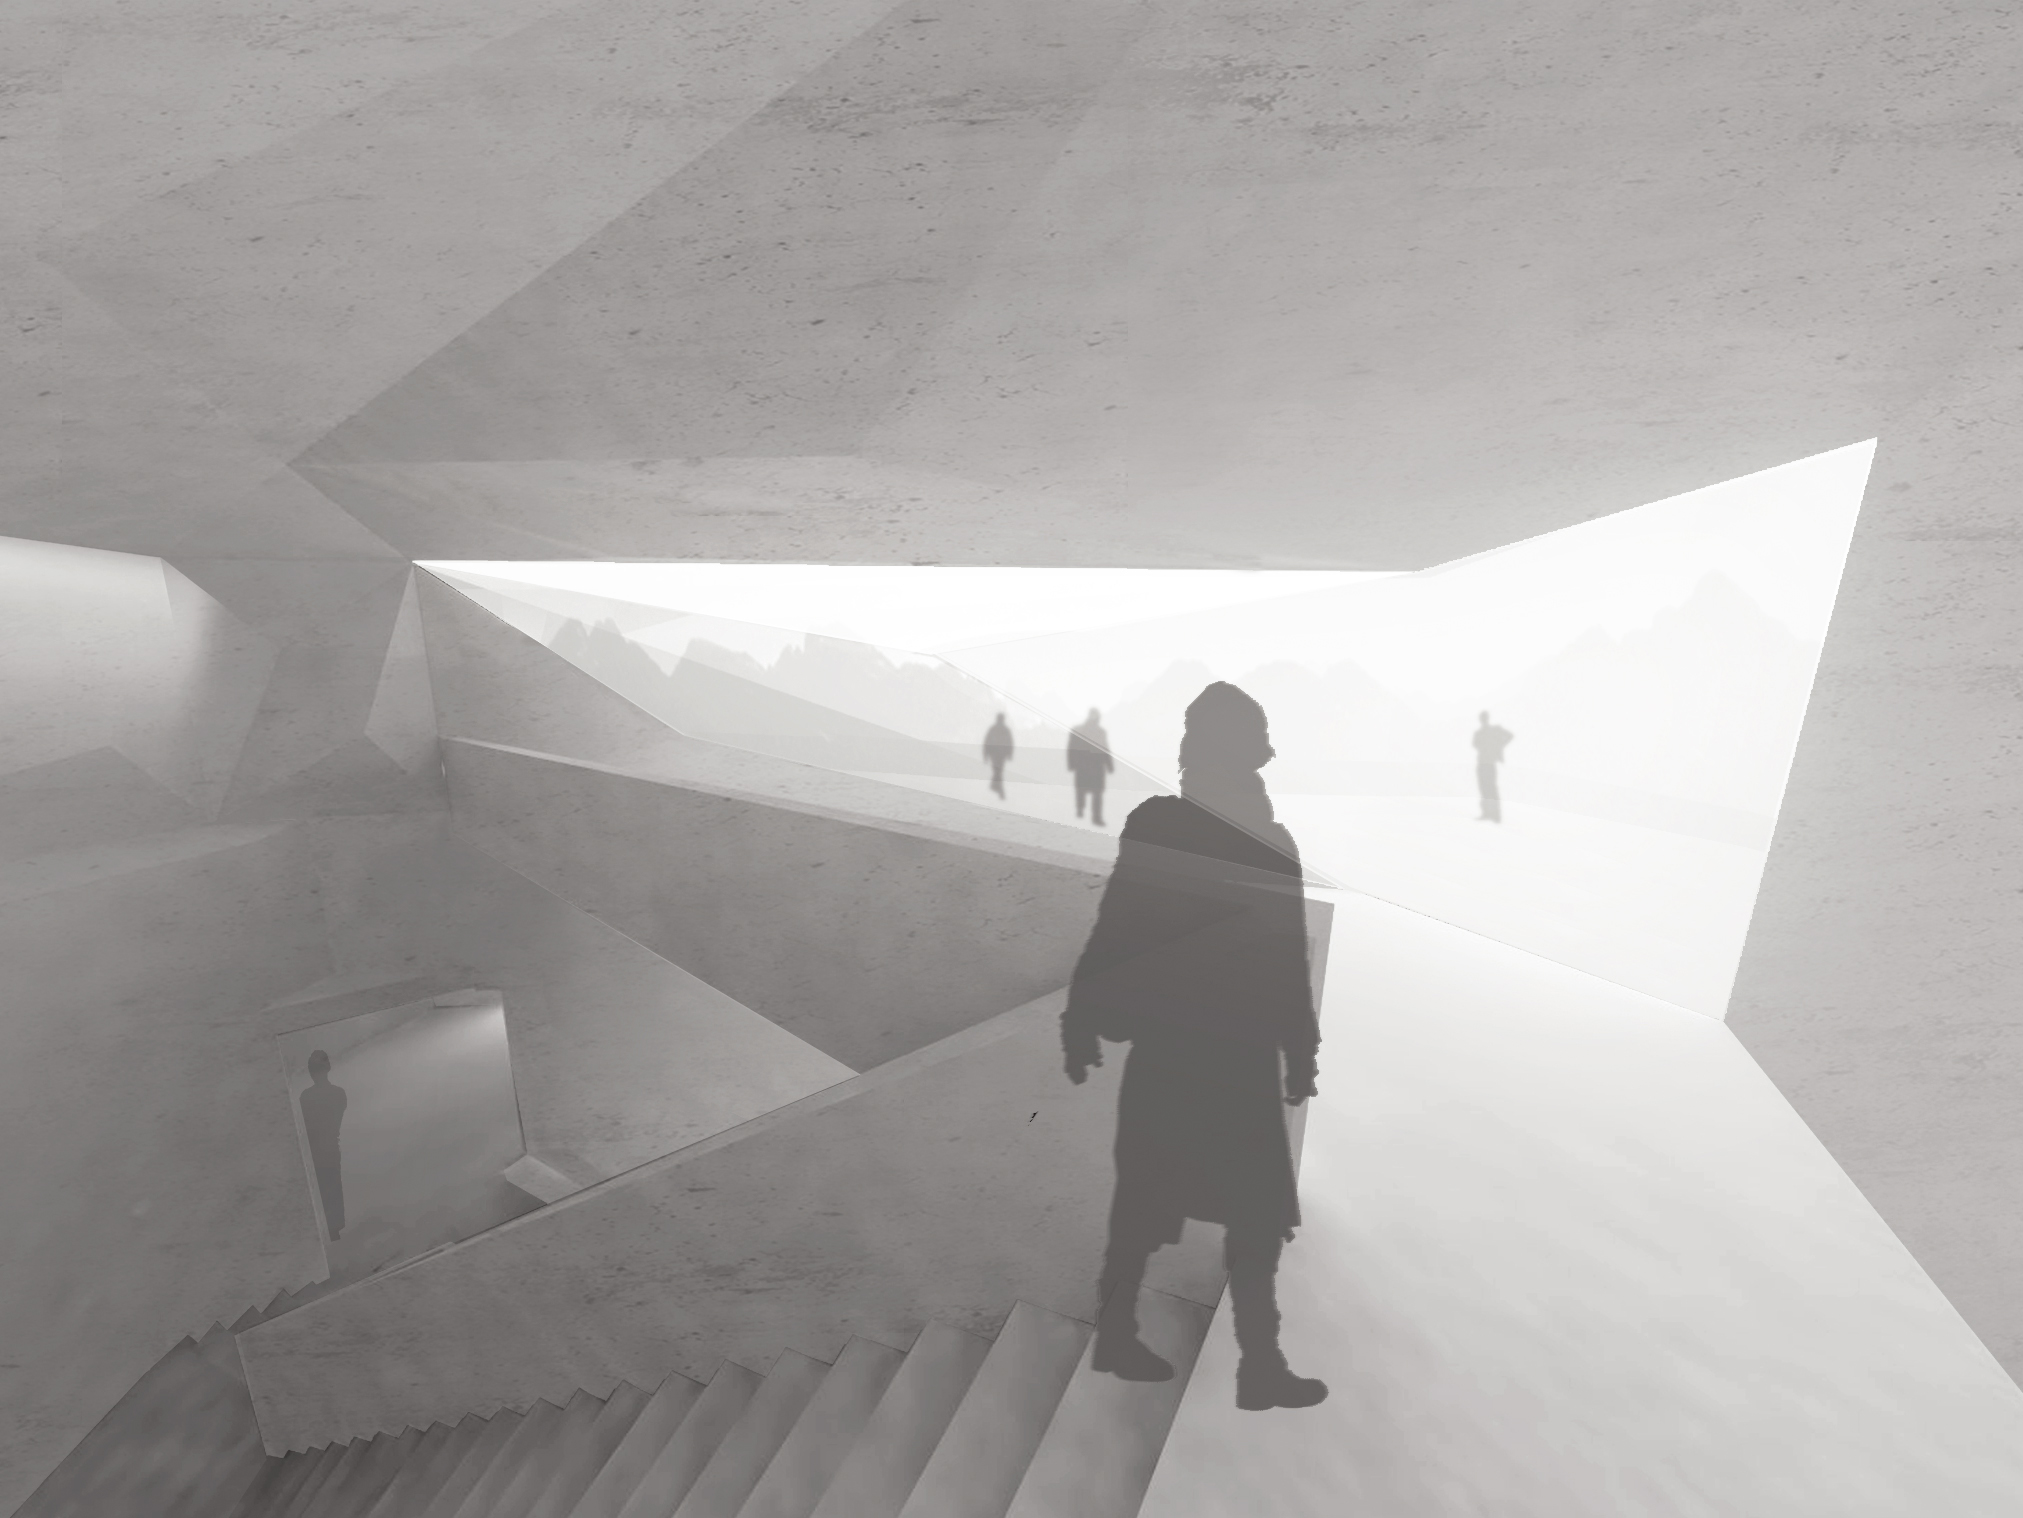 Michael-Becker-Architects-Architekten-Gipfelstation-Nebelhorn-Perspektive-K01